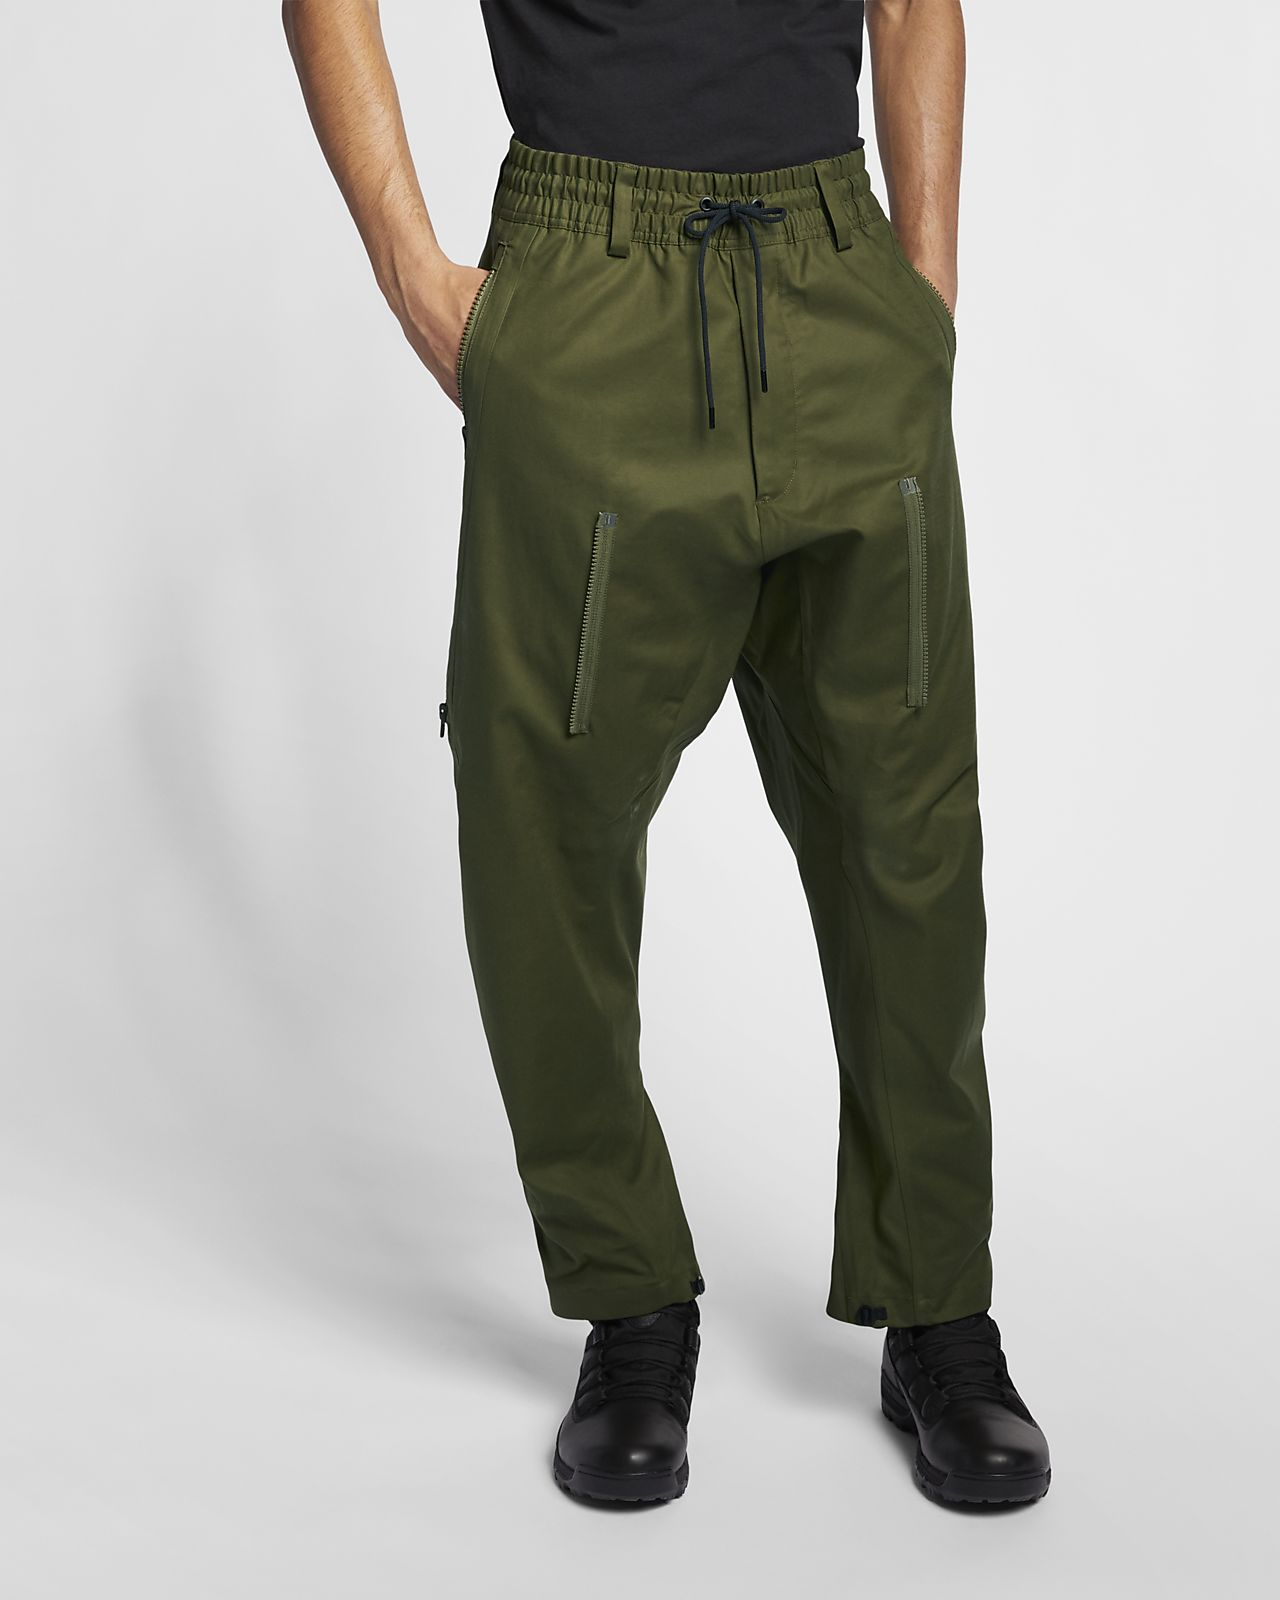 NikeLab ACG Men's Cargo Pants